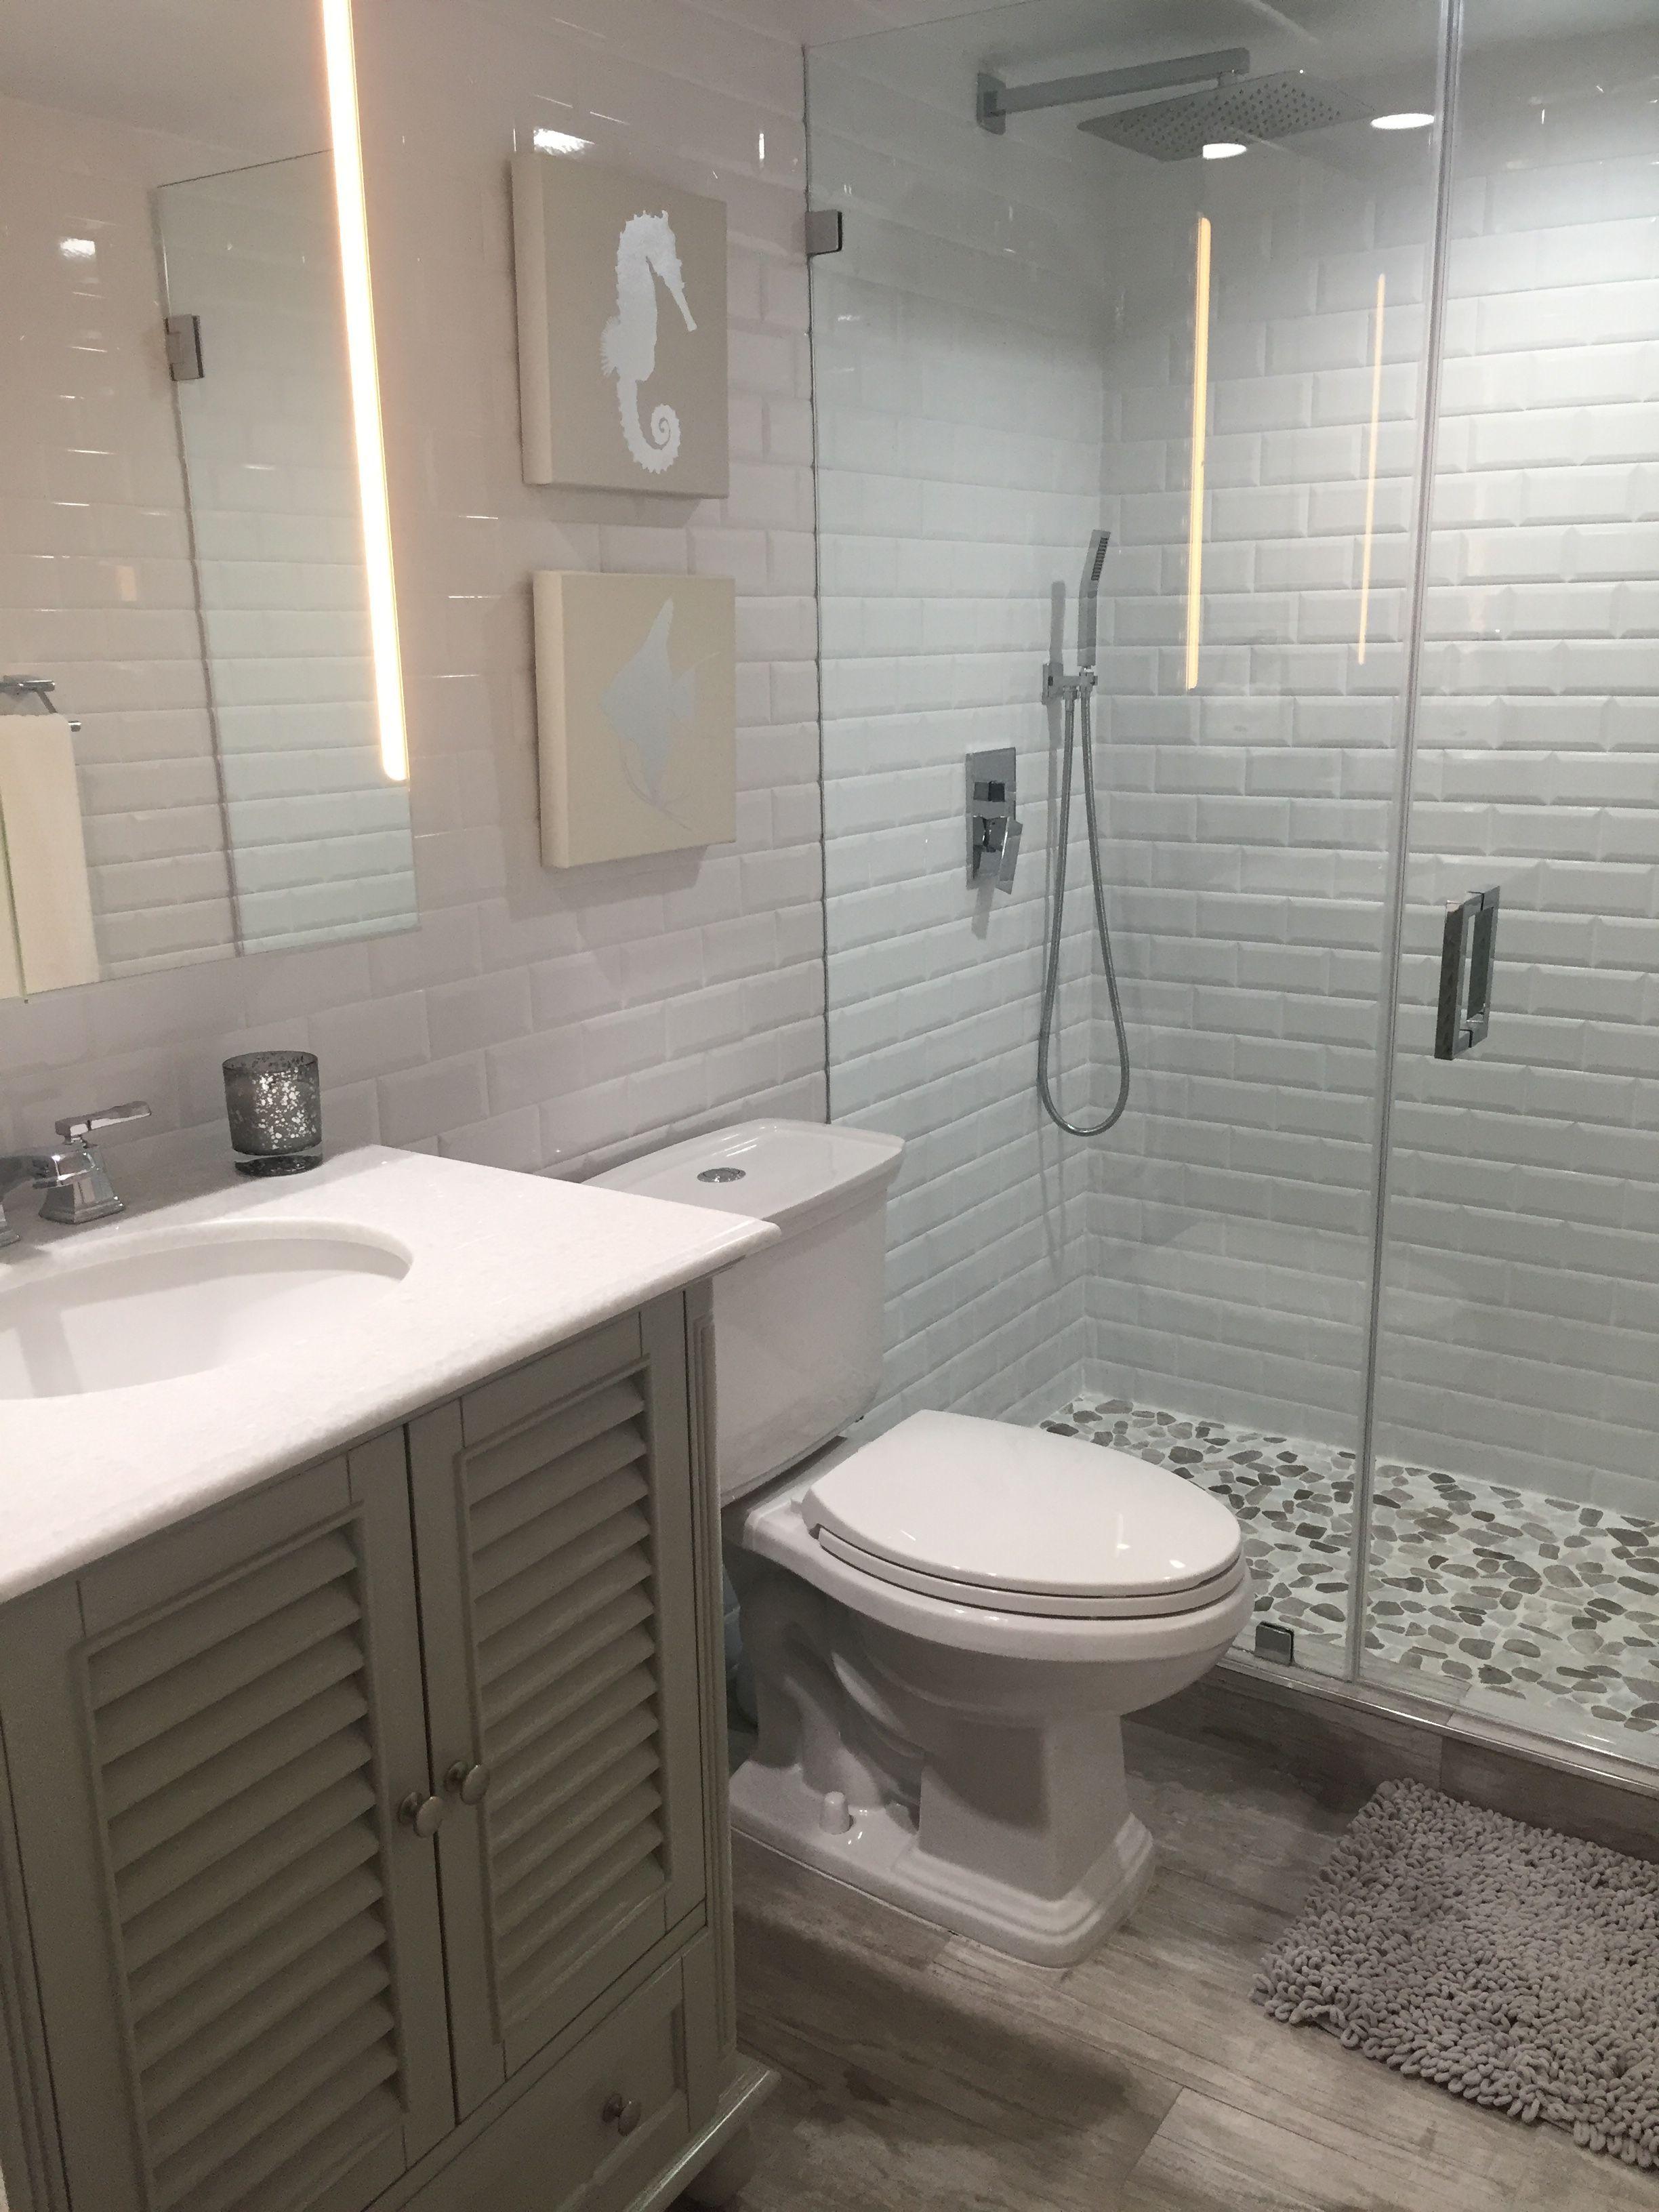 15 bathroom remodel ideas condo bathroom bathroom on bathroom renovation ideas id=55051